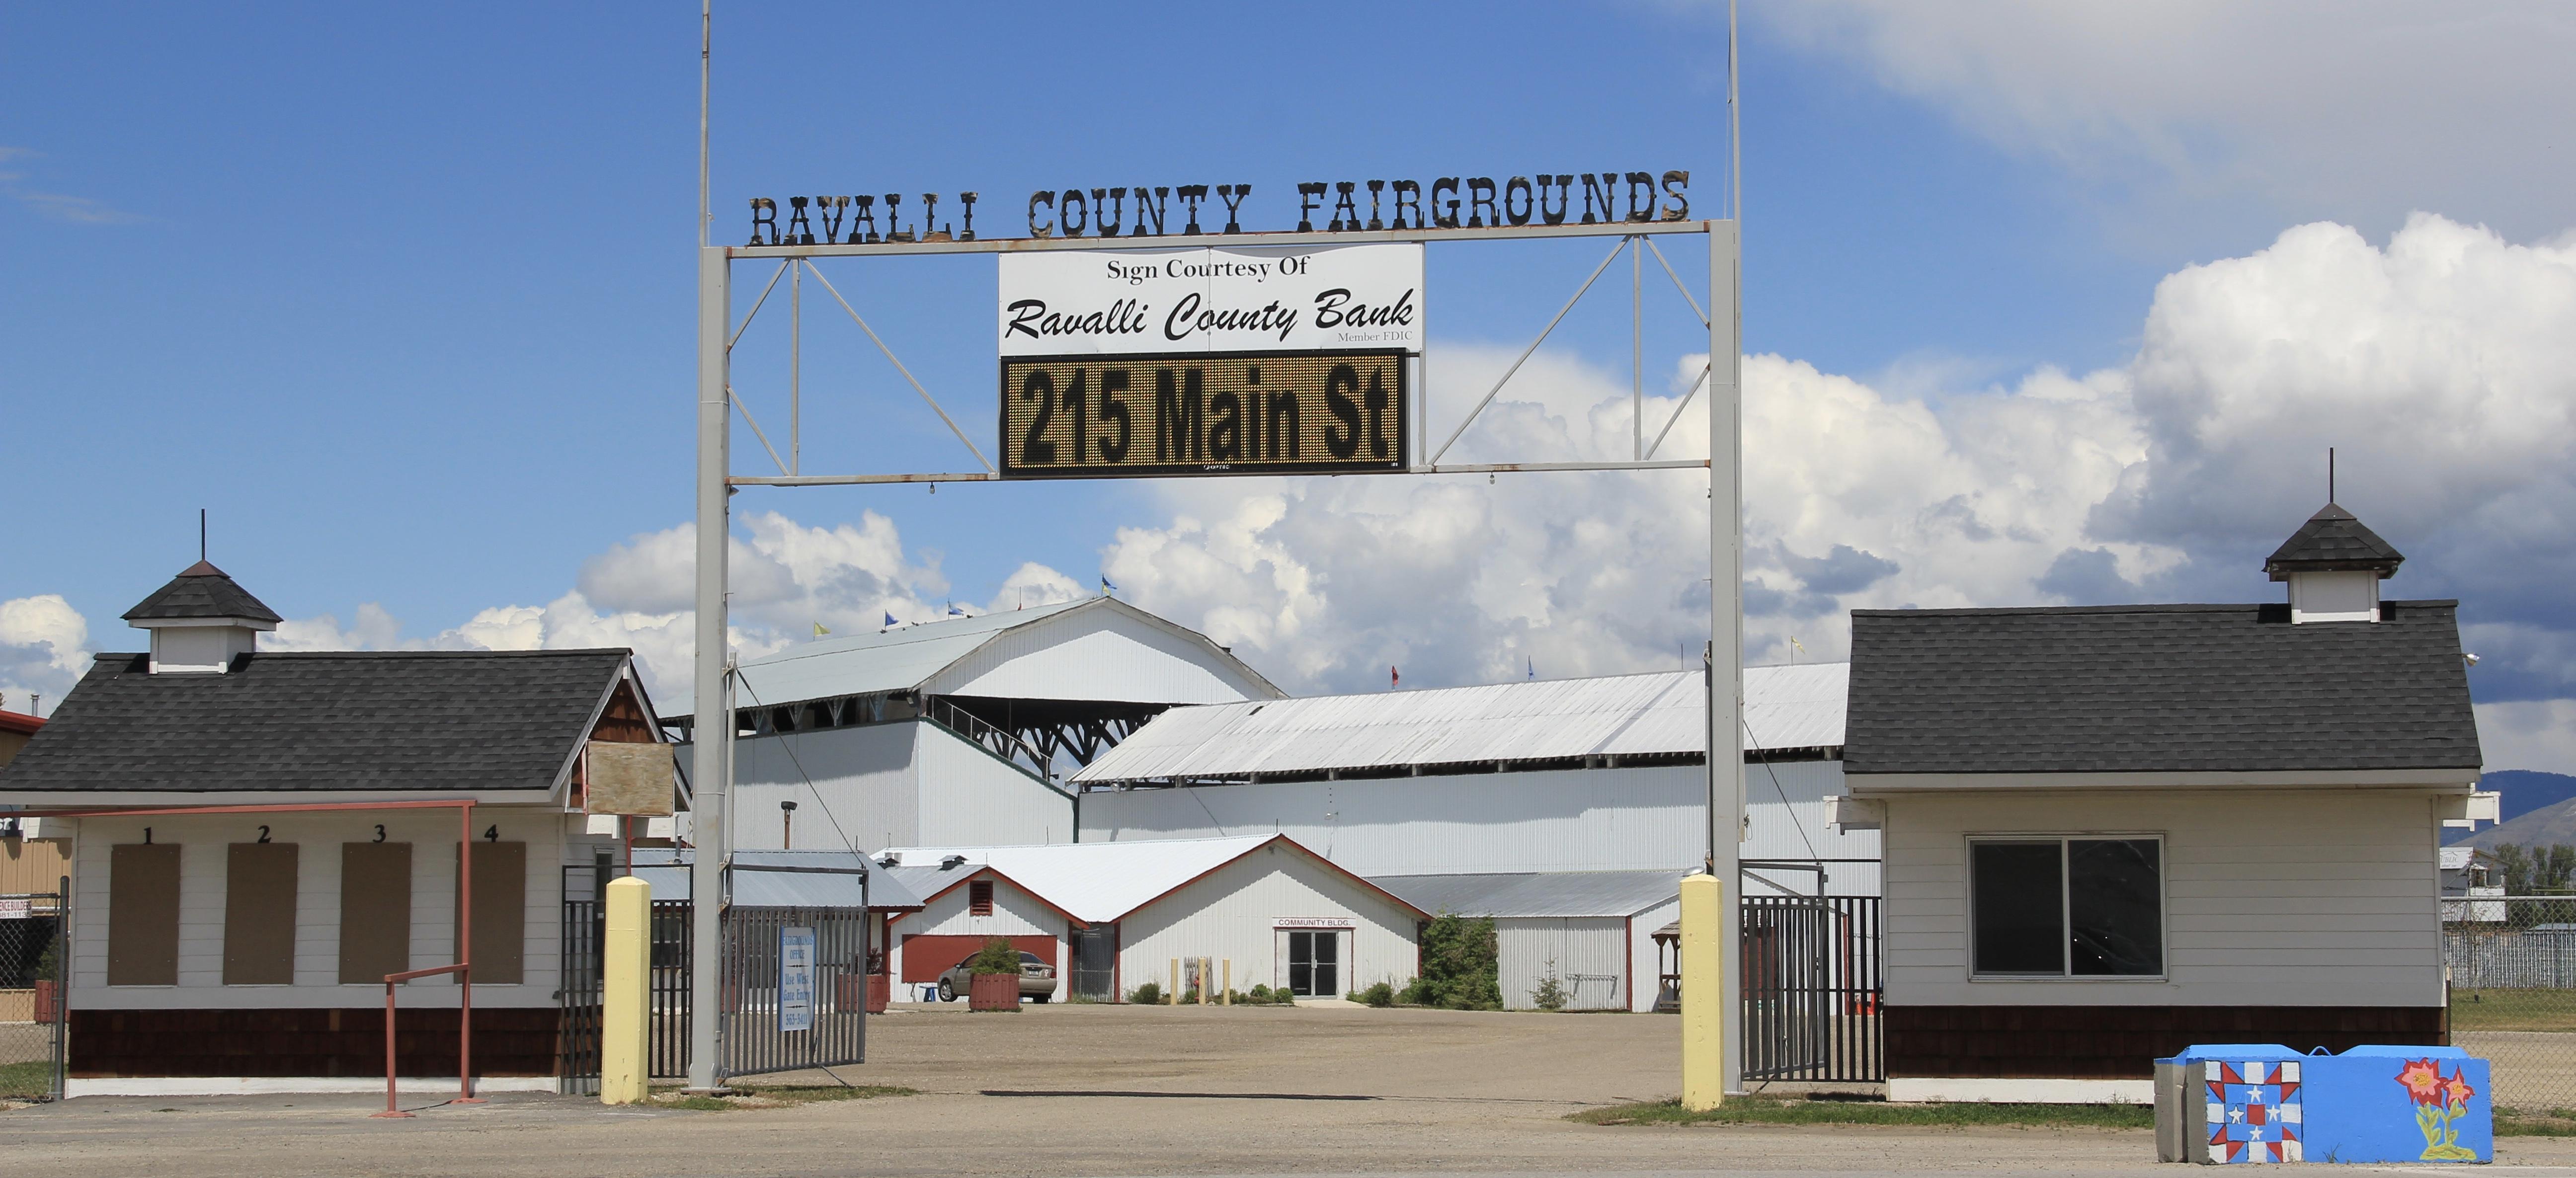 Ravalli County Fairgrounds, Hamilton 4